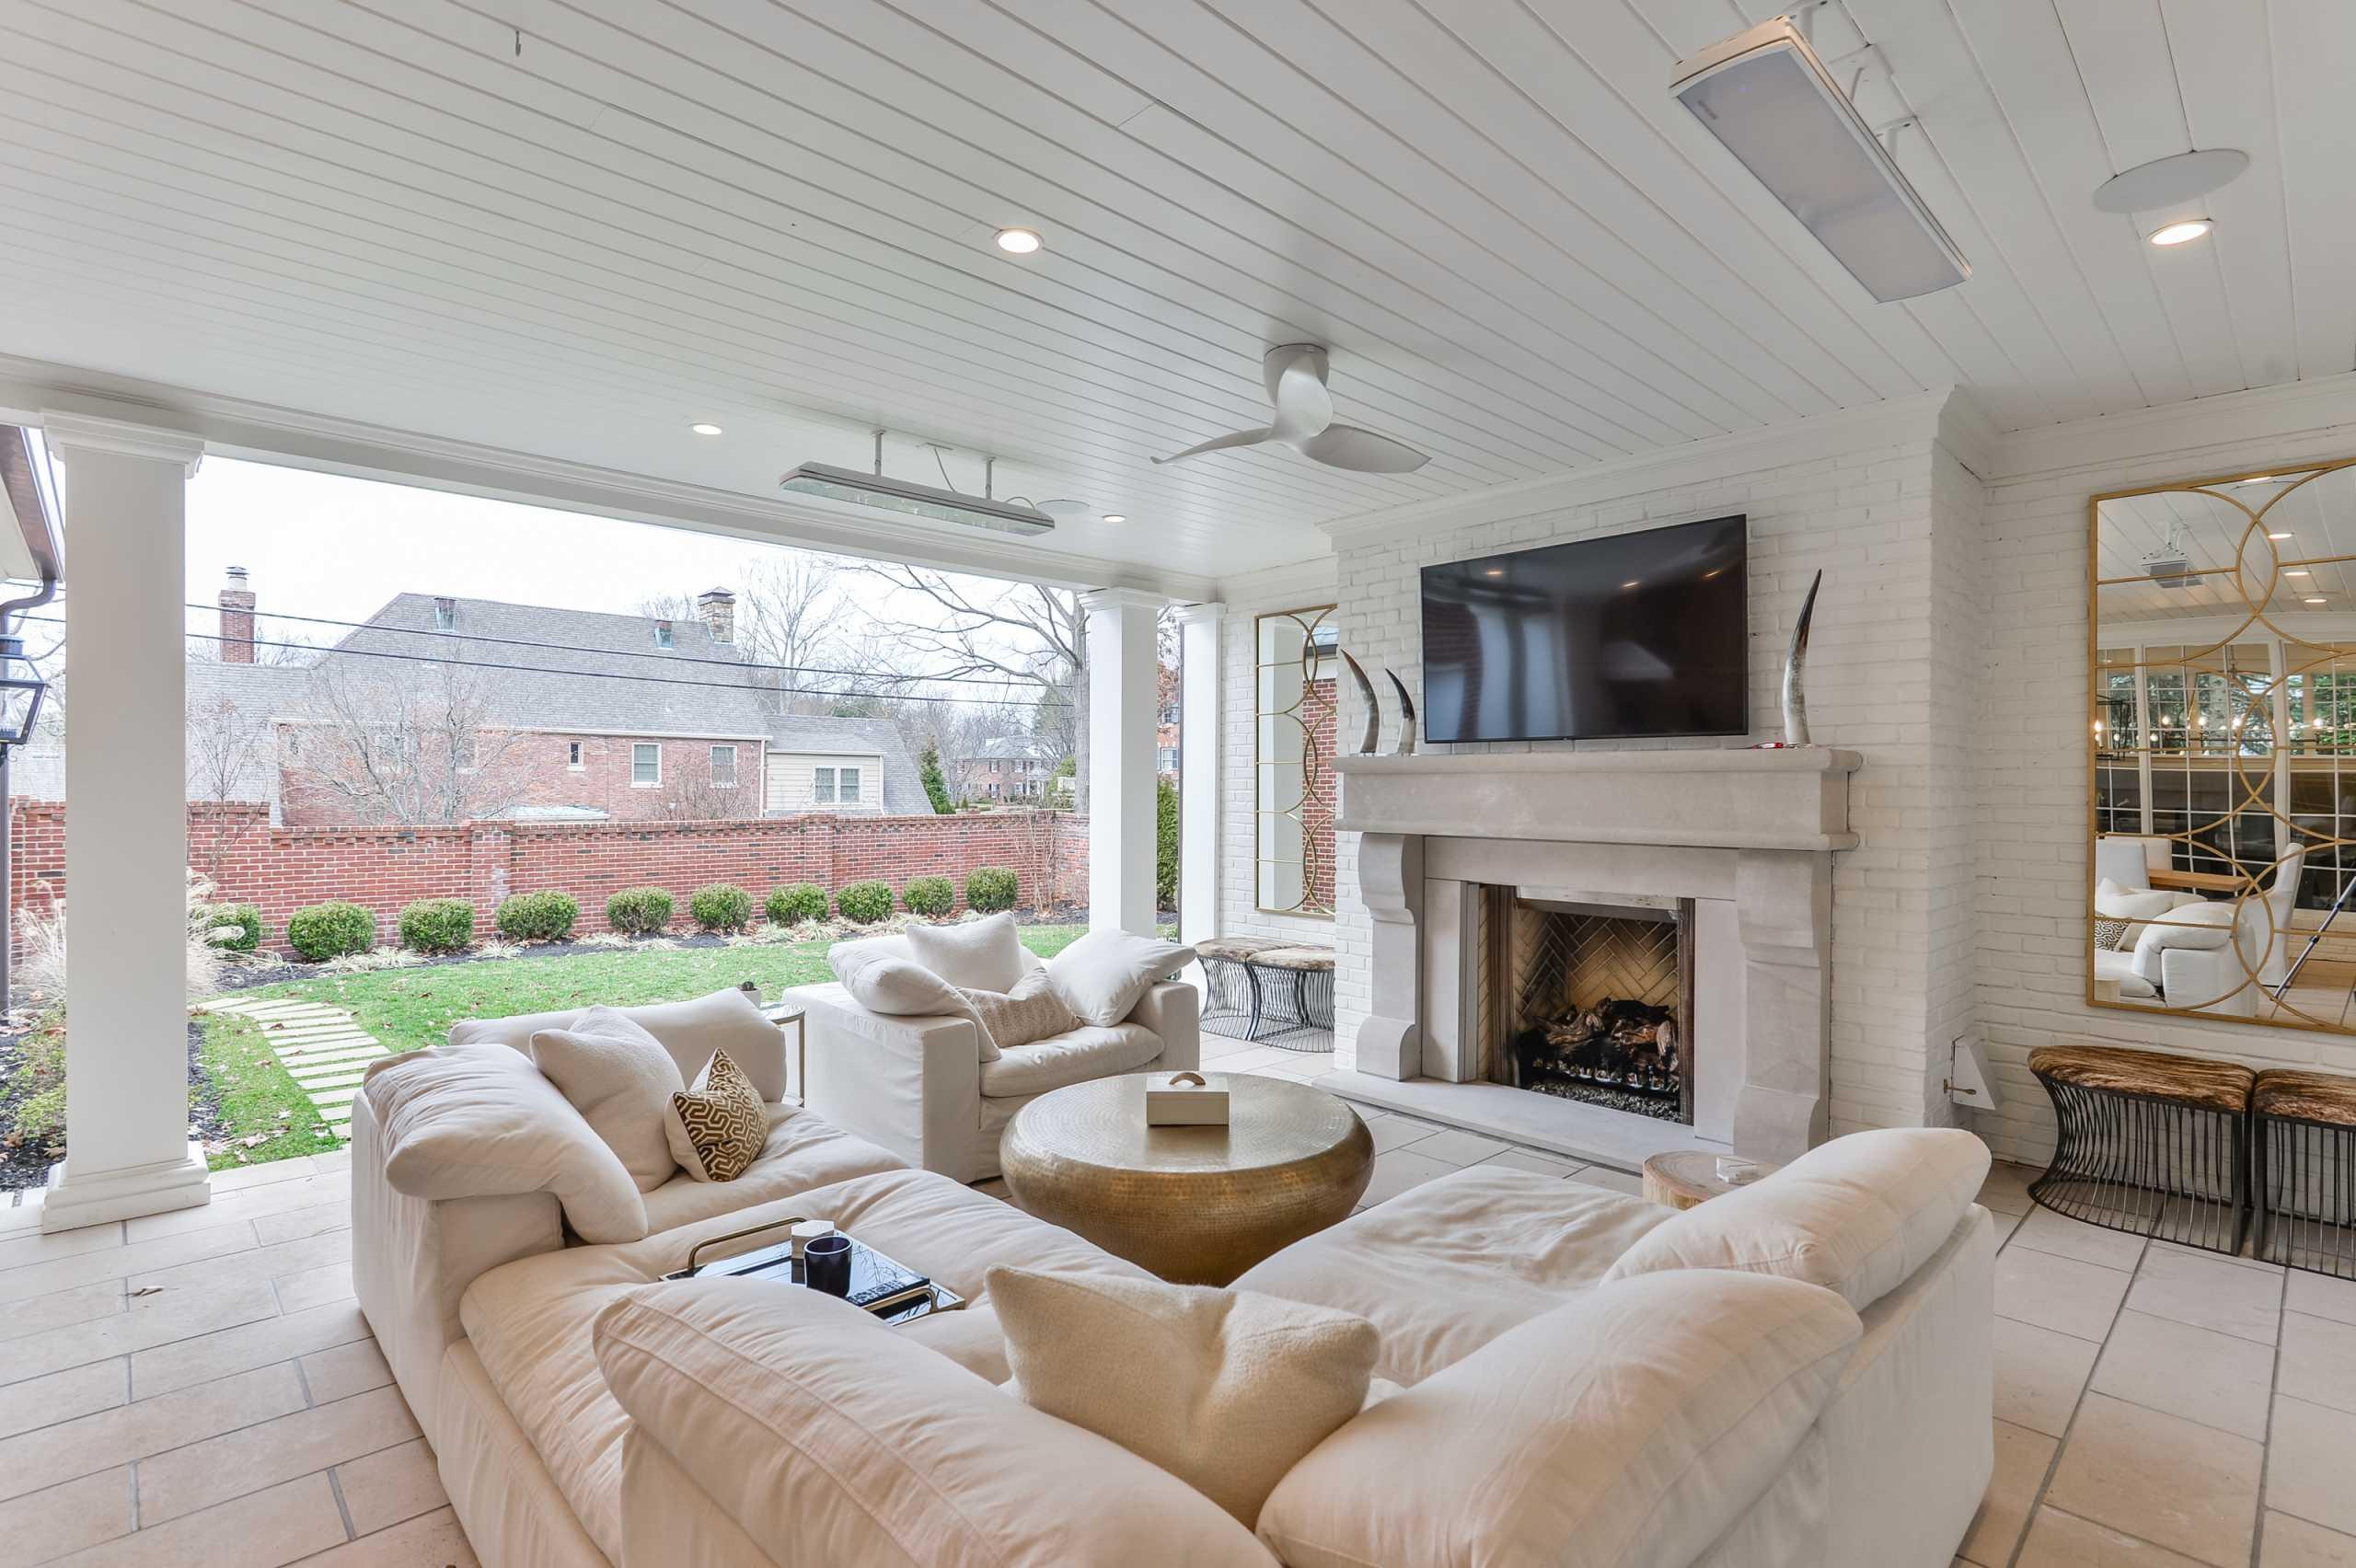 Louisville Outdoor Patio Living Furniture